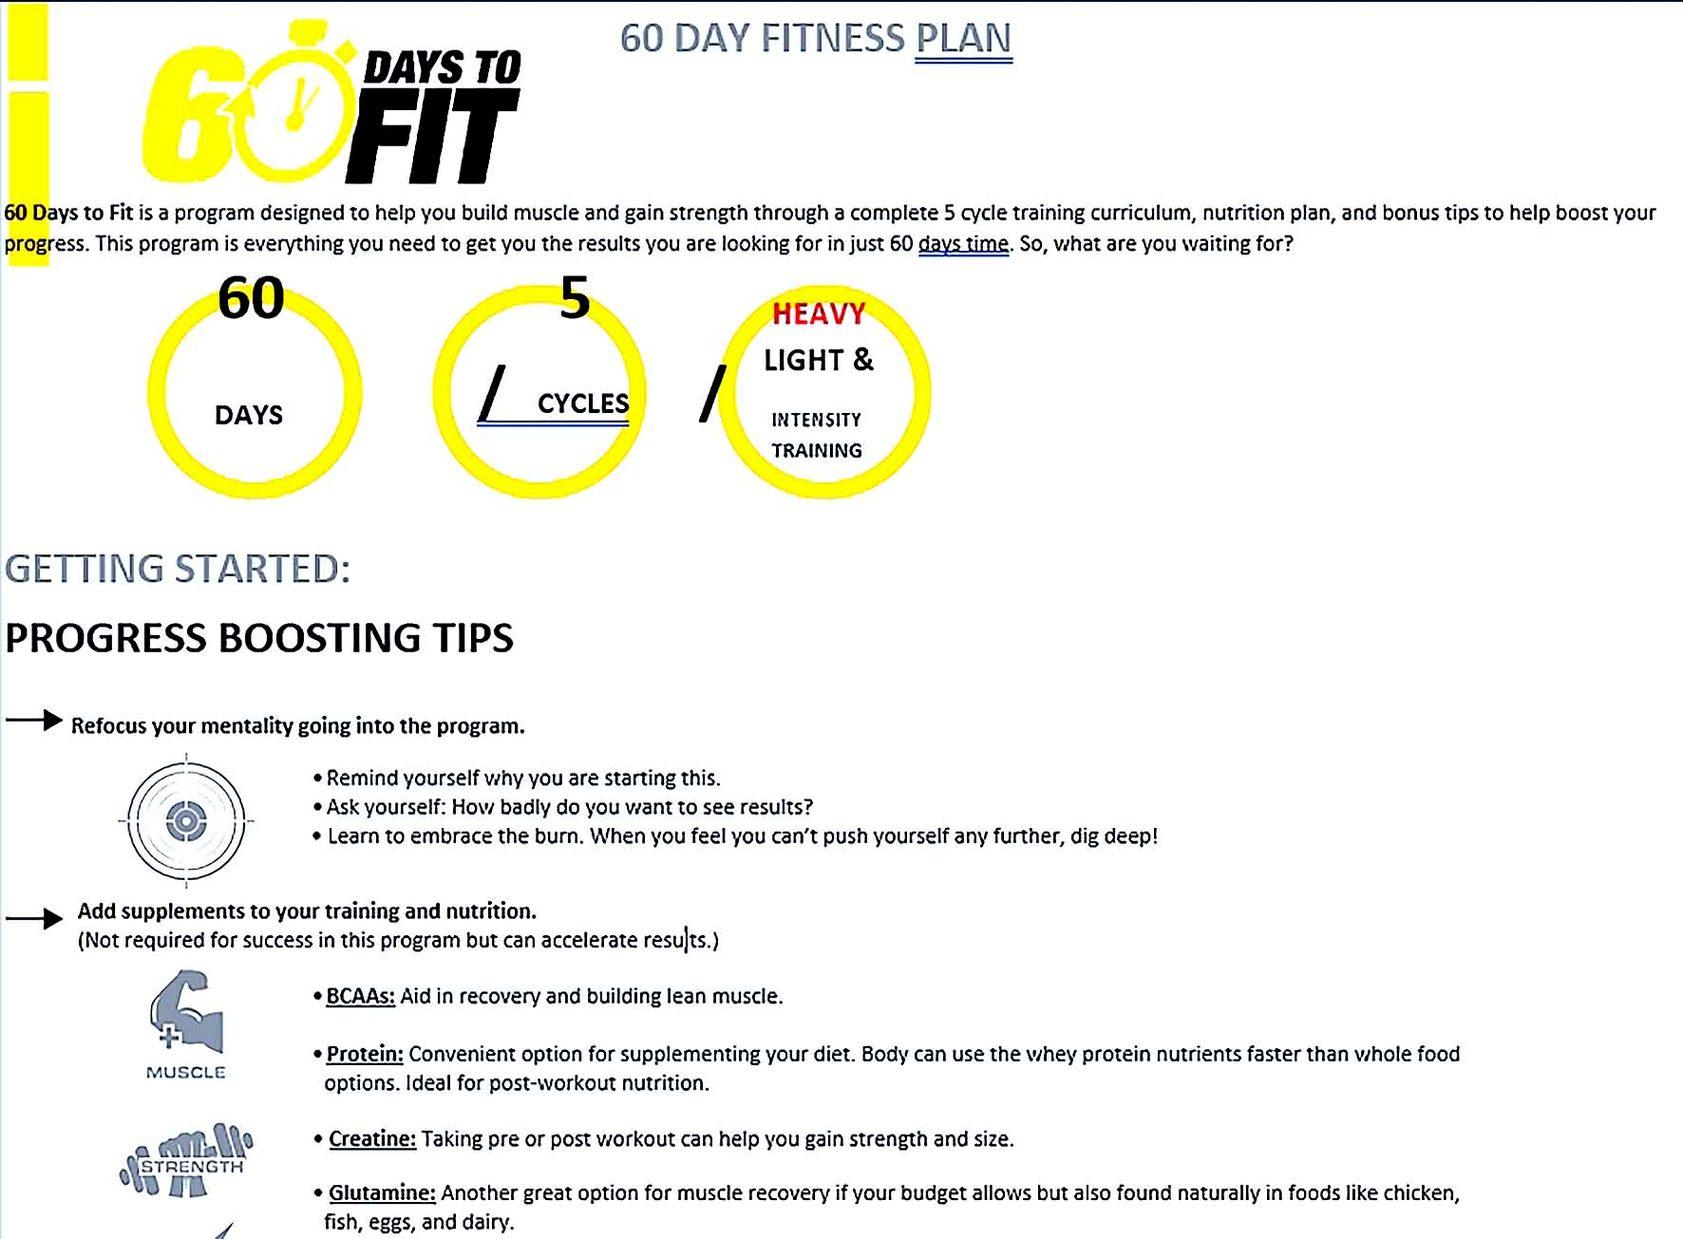 60 days to fit program